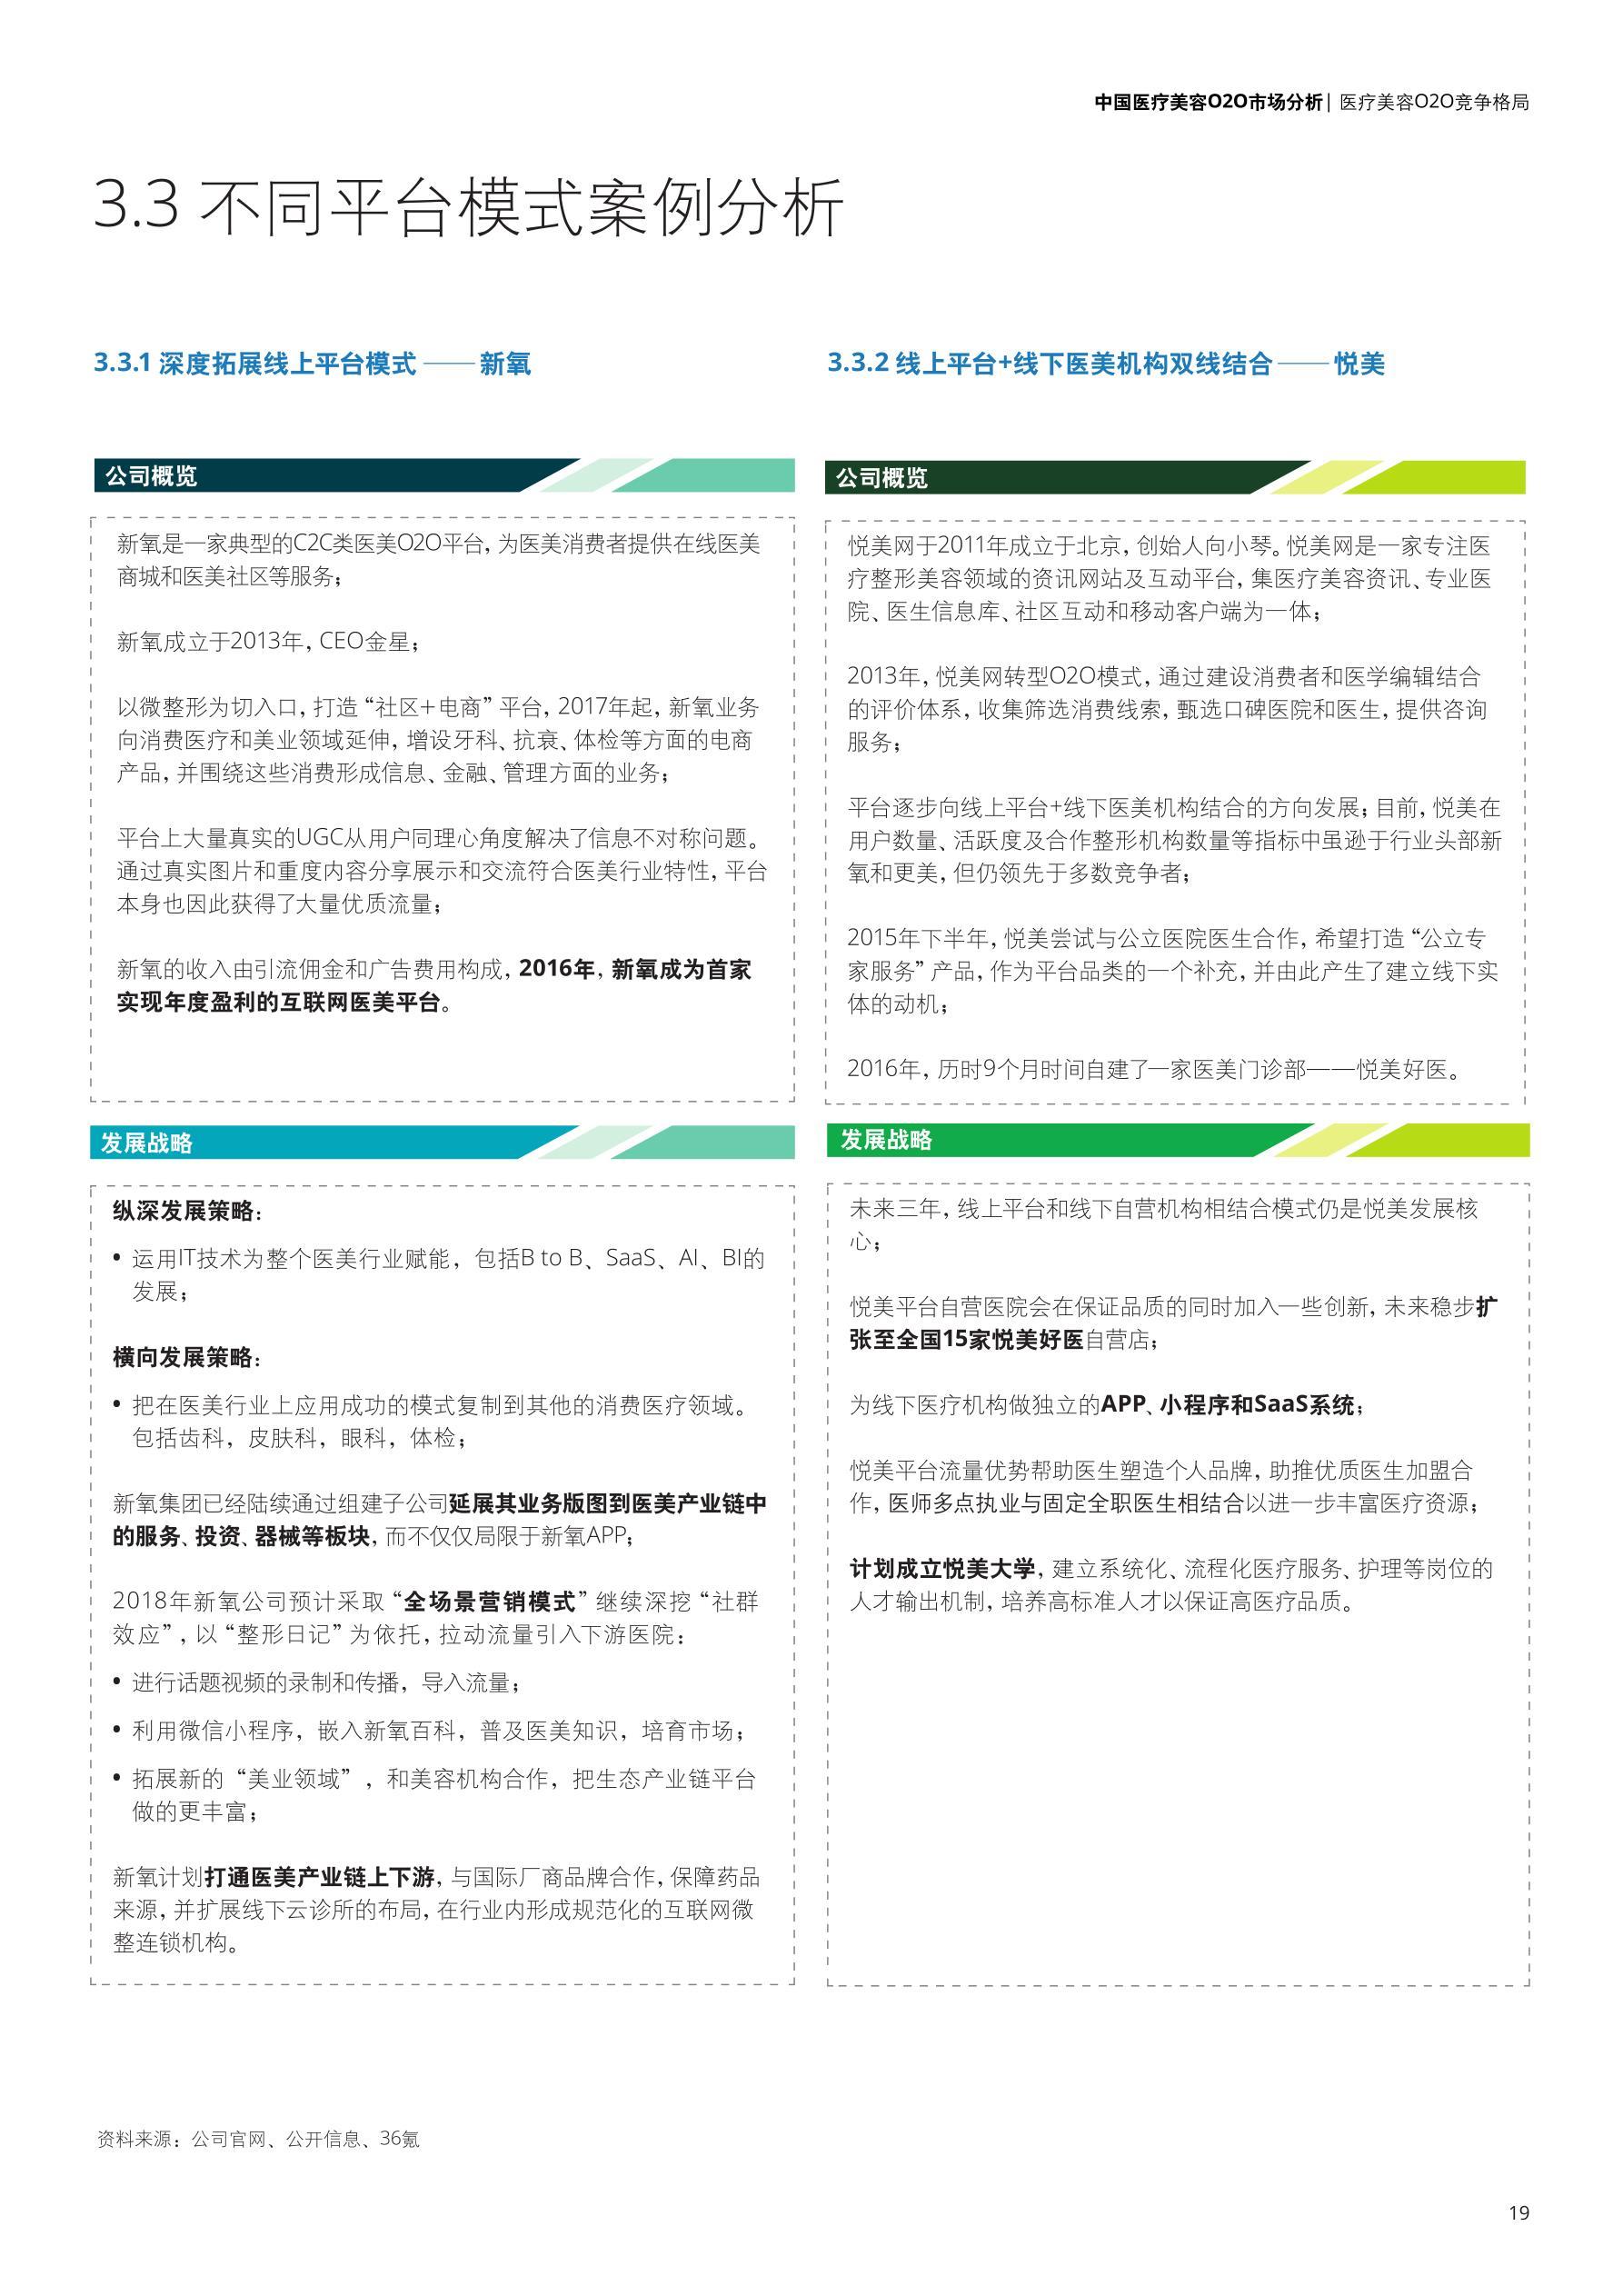 deloitte-cn-lshc-china-medical-cosmetology-o2o-market-analysis-zh-180914(1)_看图王_21